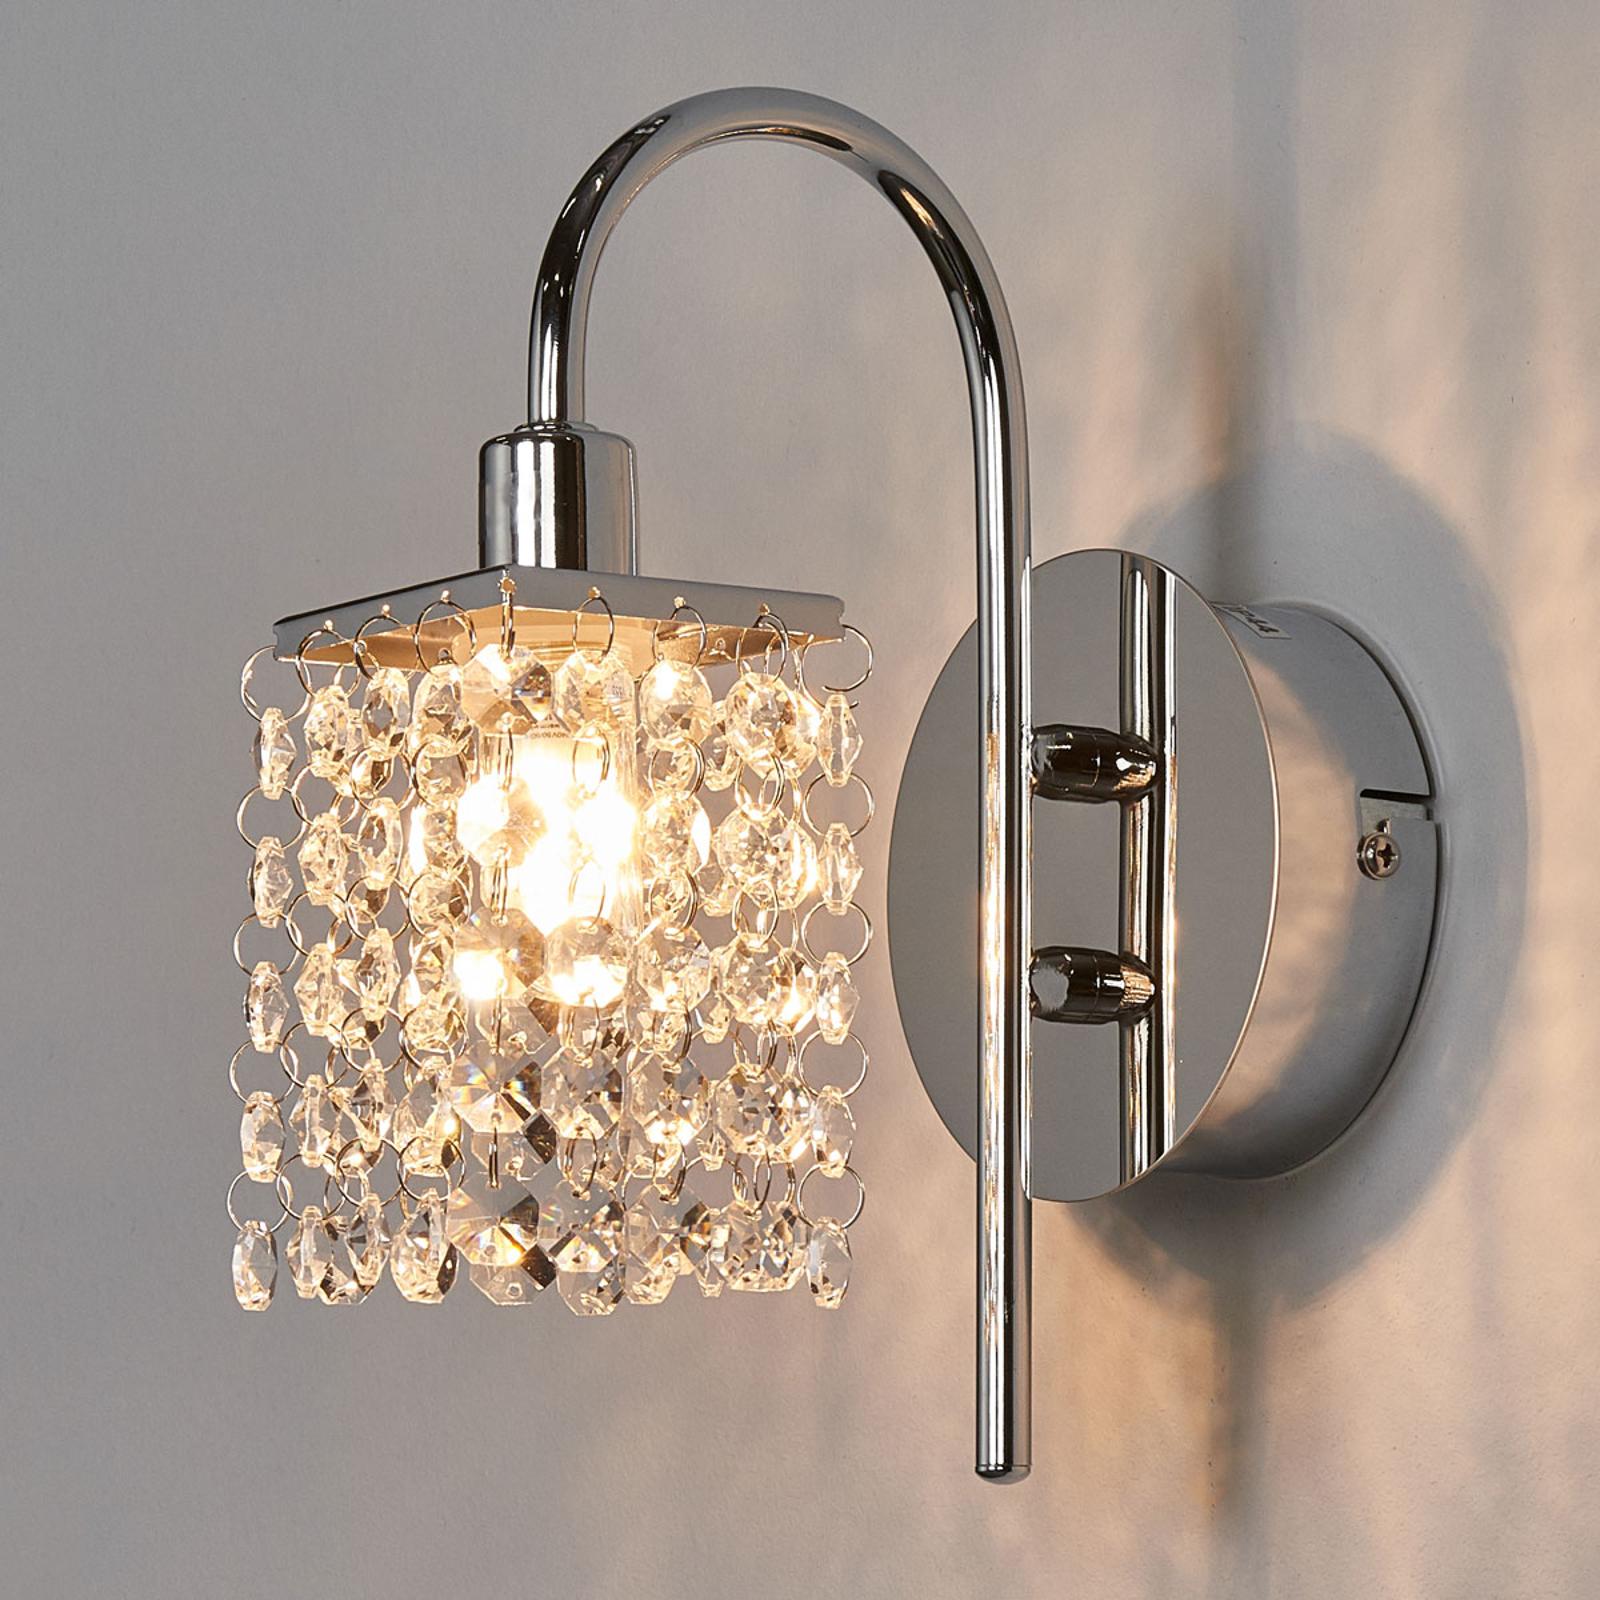 Bonita lámpara de pared LED Almonte cristal, IP44